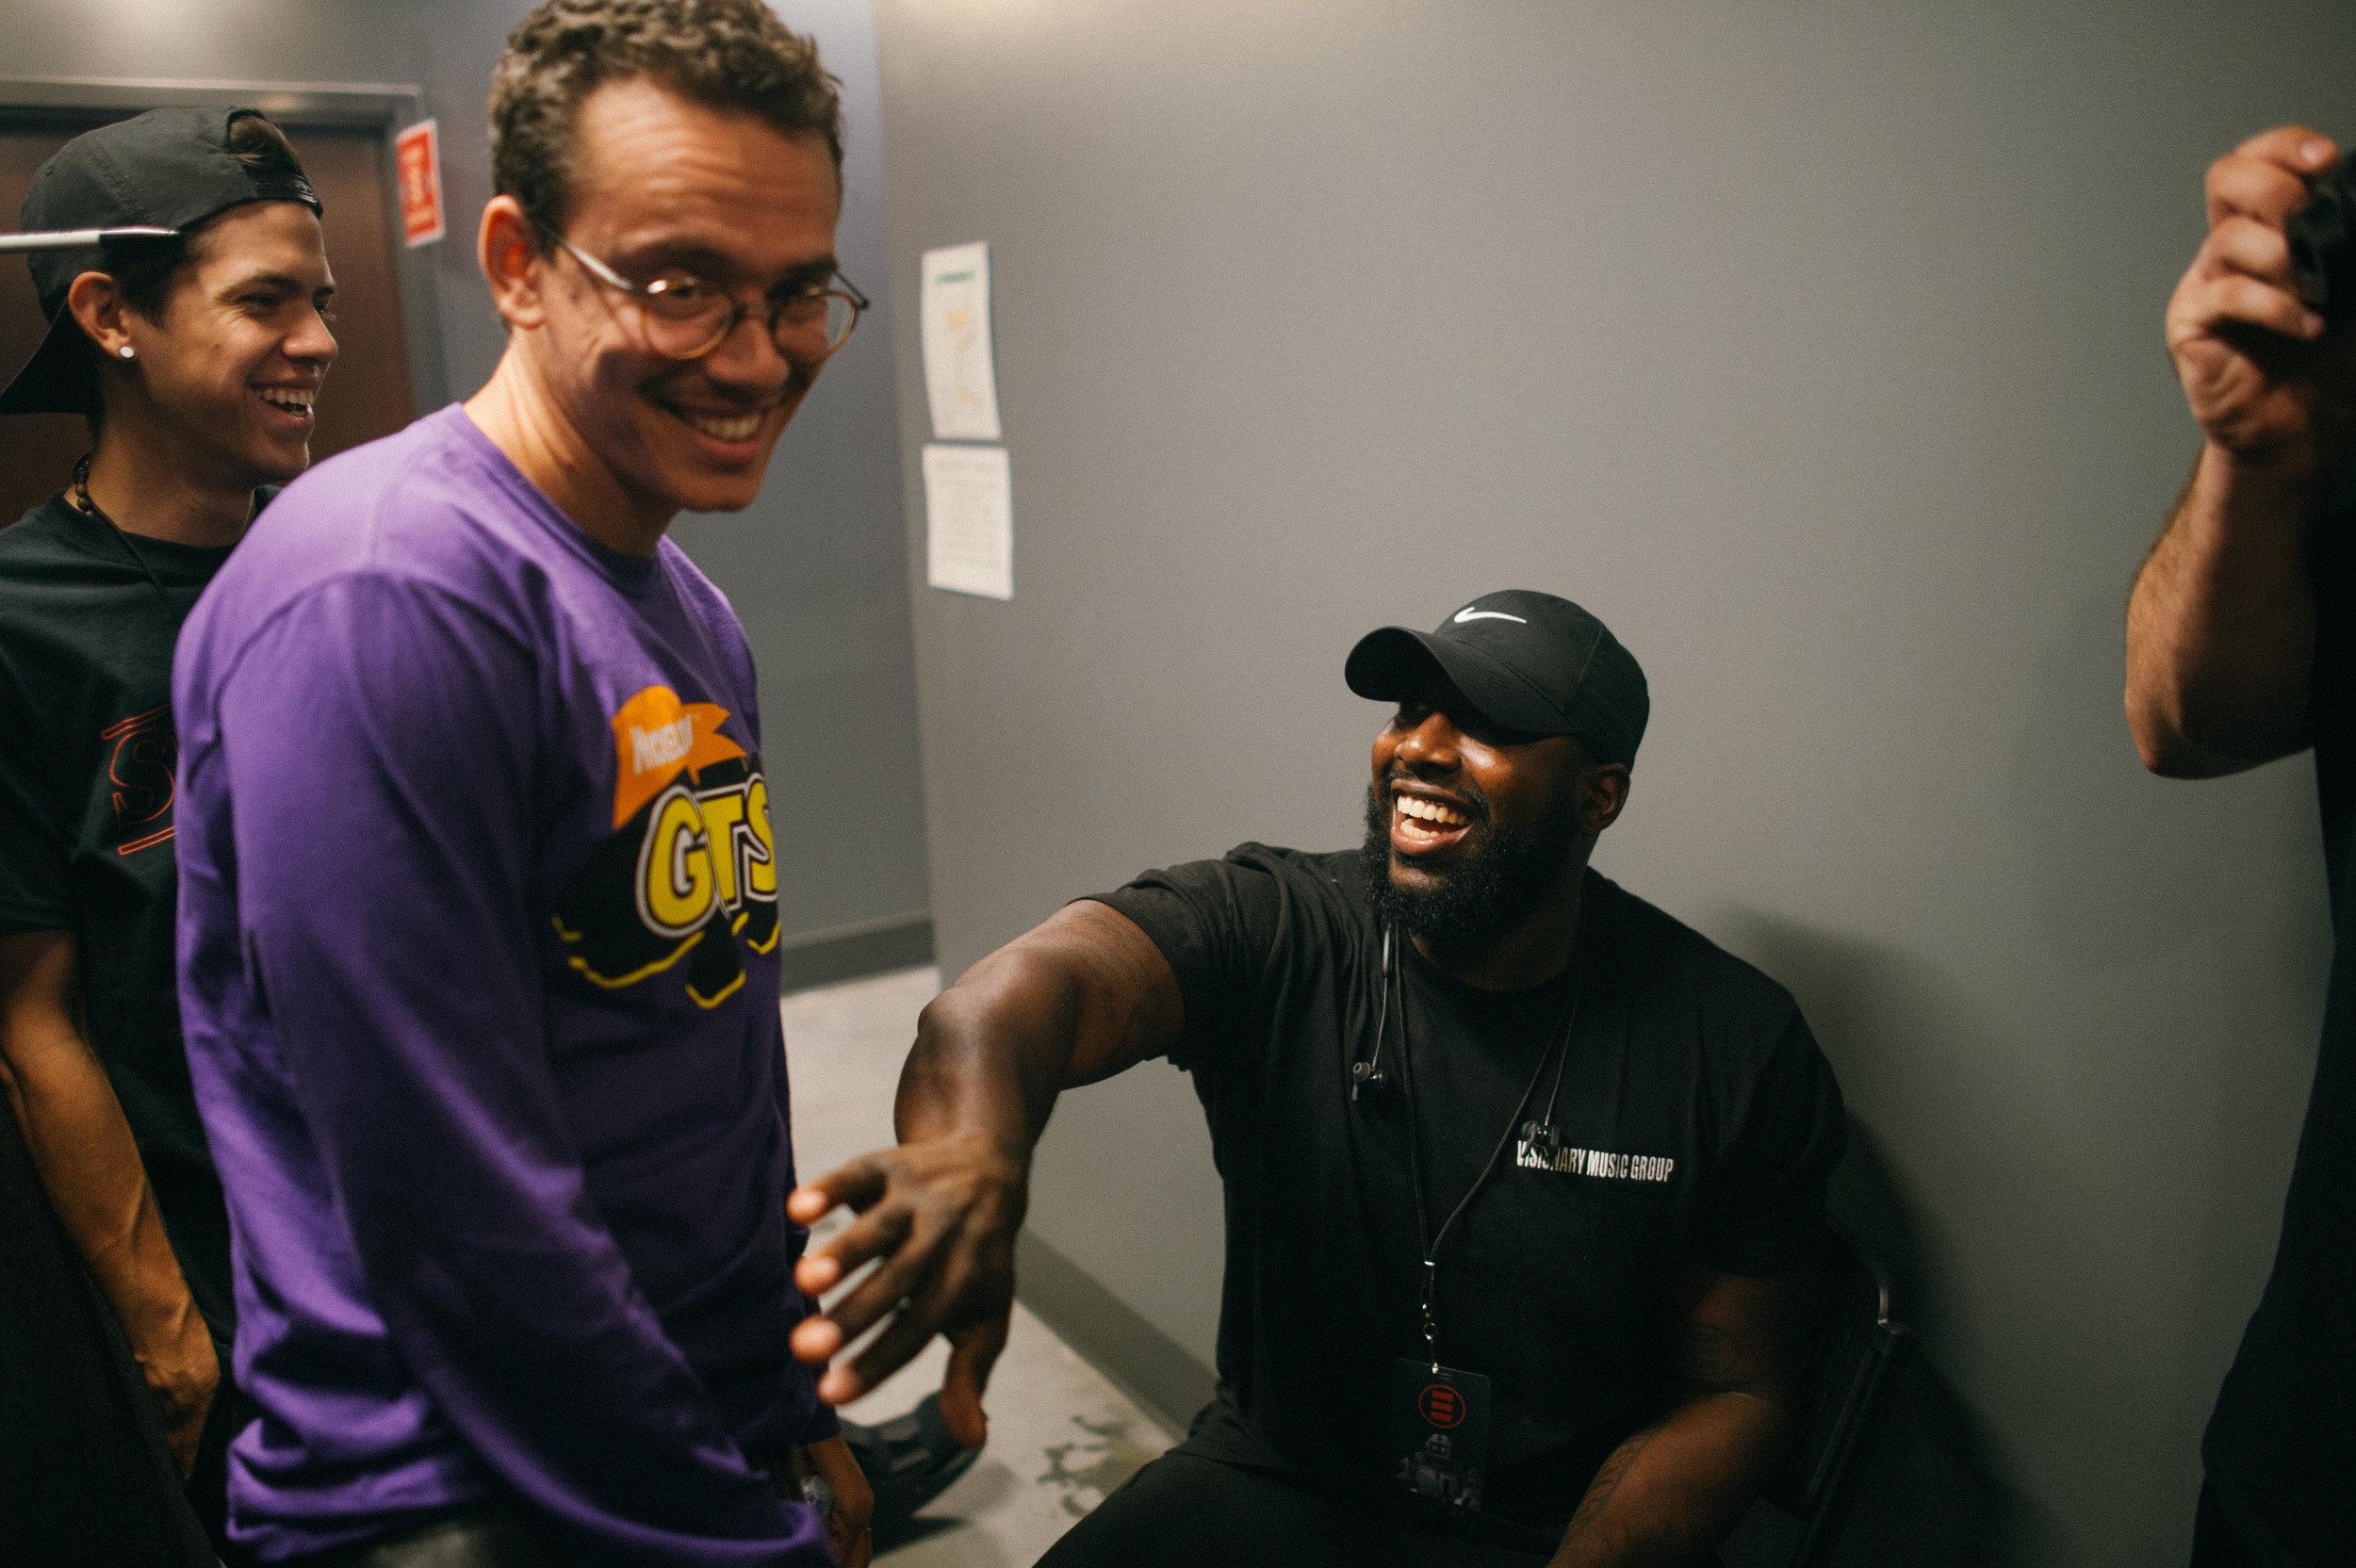 Bobby and Jordan, his bodygaurd joking around backstage in Atlanta